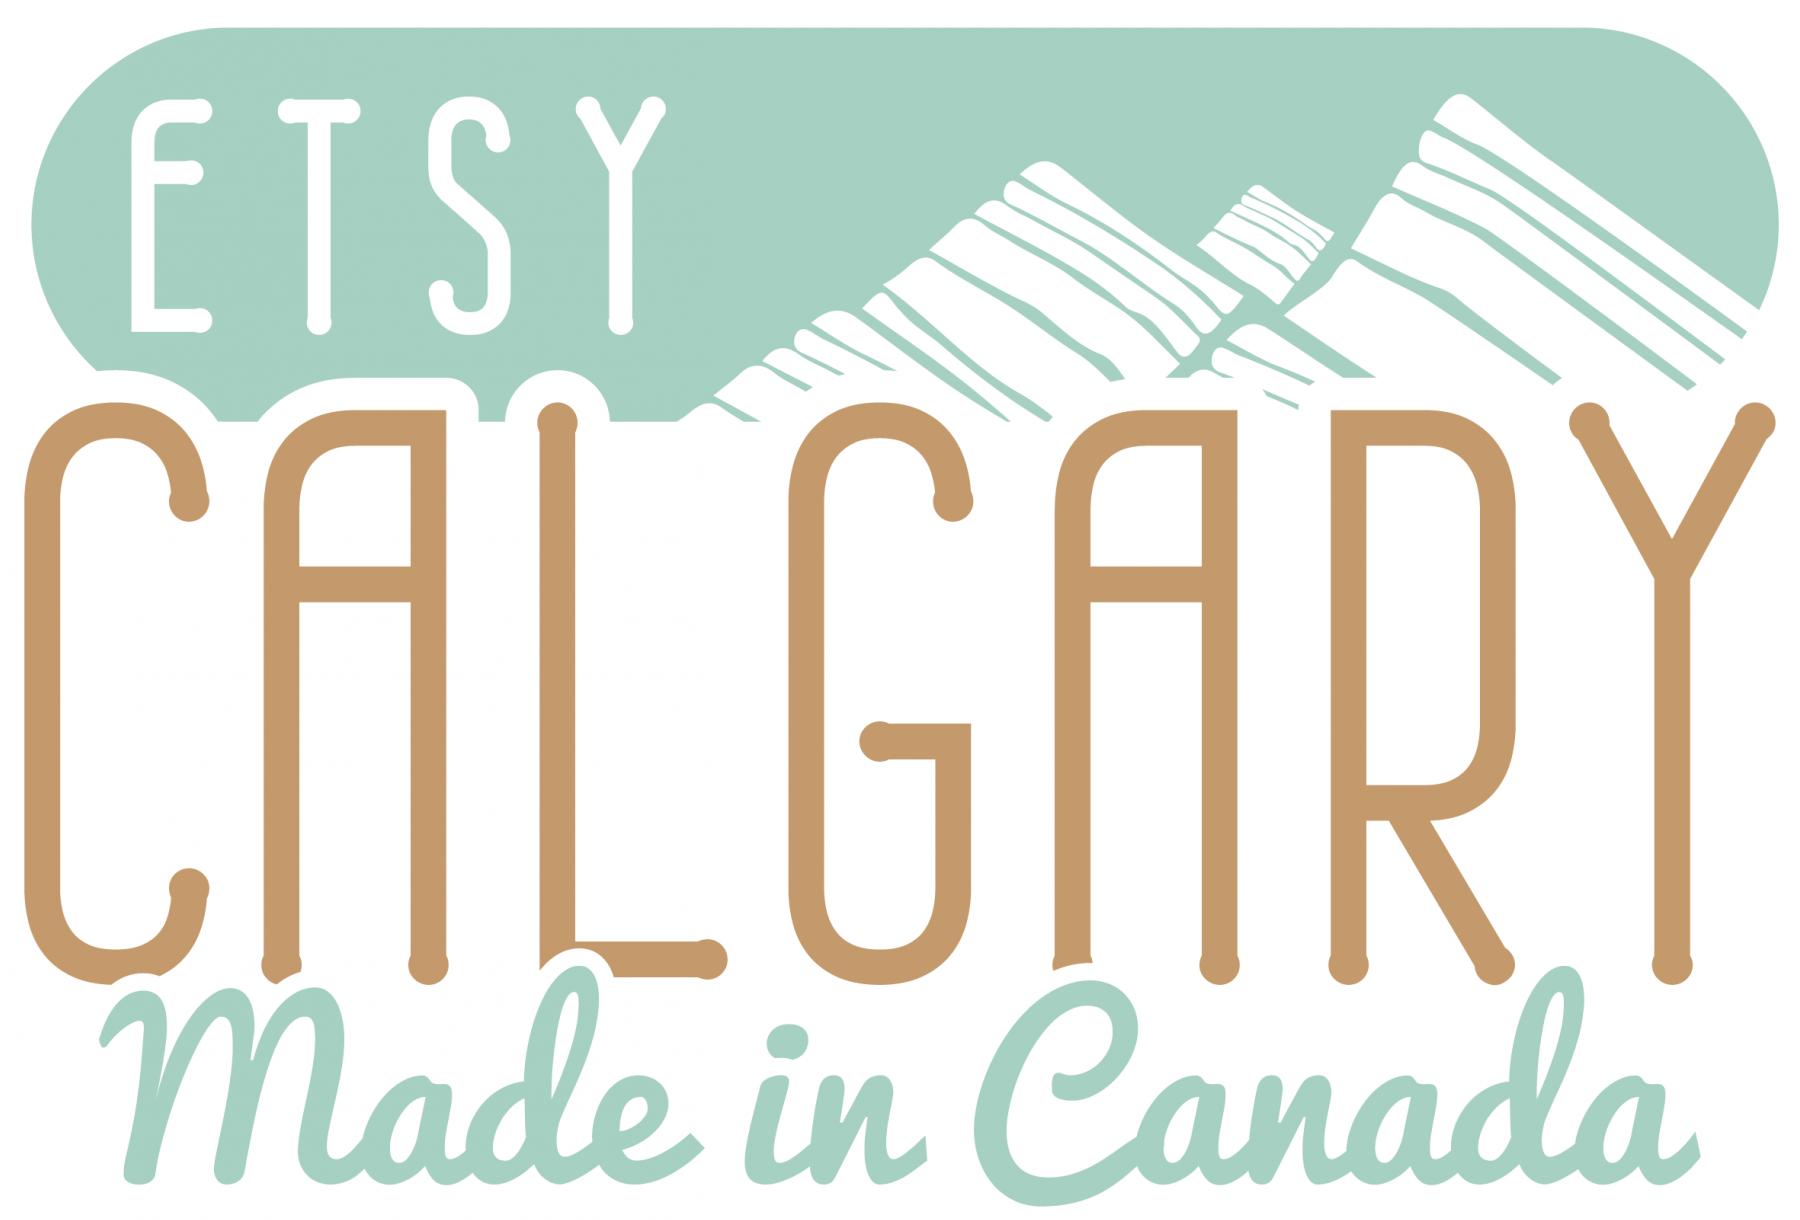 cropped-Etsy-Calgary-Logo-White-BG.png